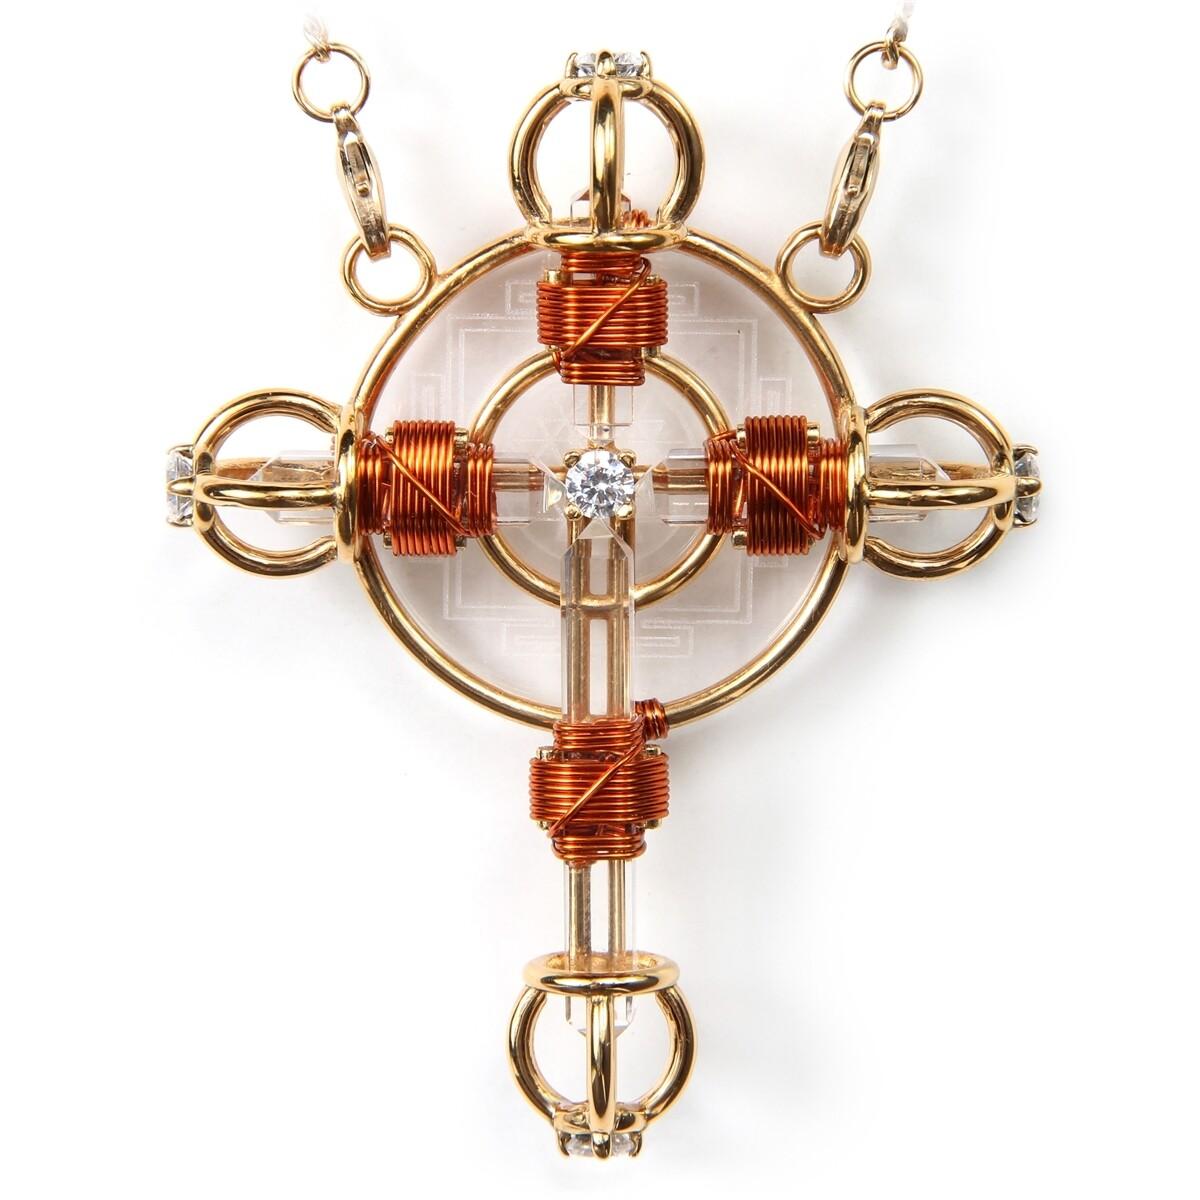 Buddha Maitreya the Christ 24K Gold-plated Shambhala Christ Cross Radiator with Copper wire